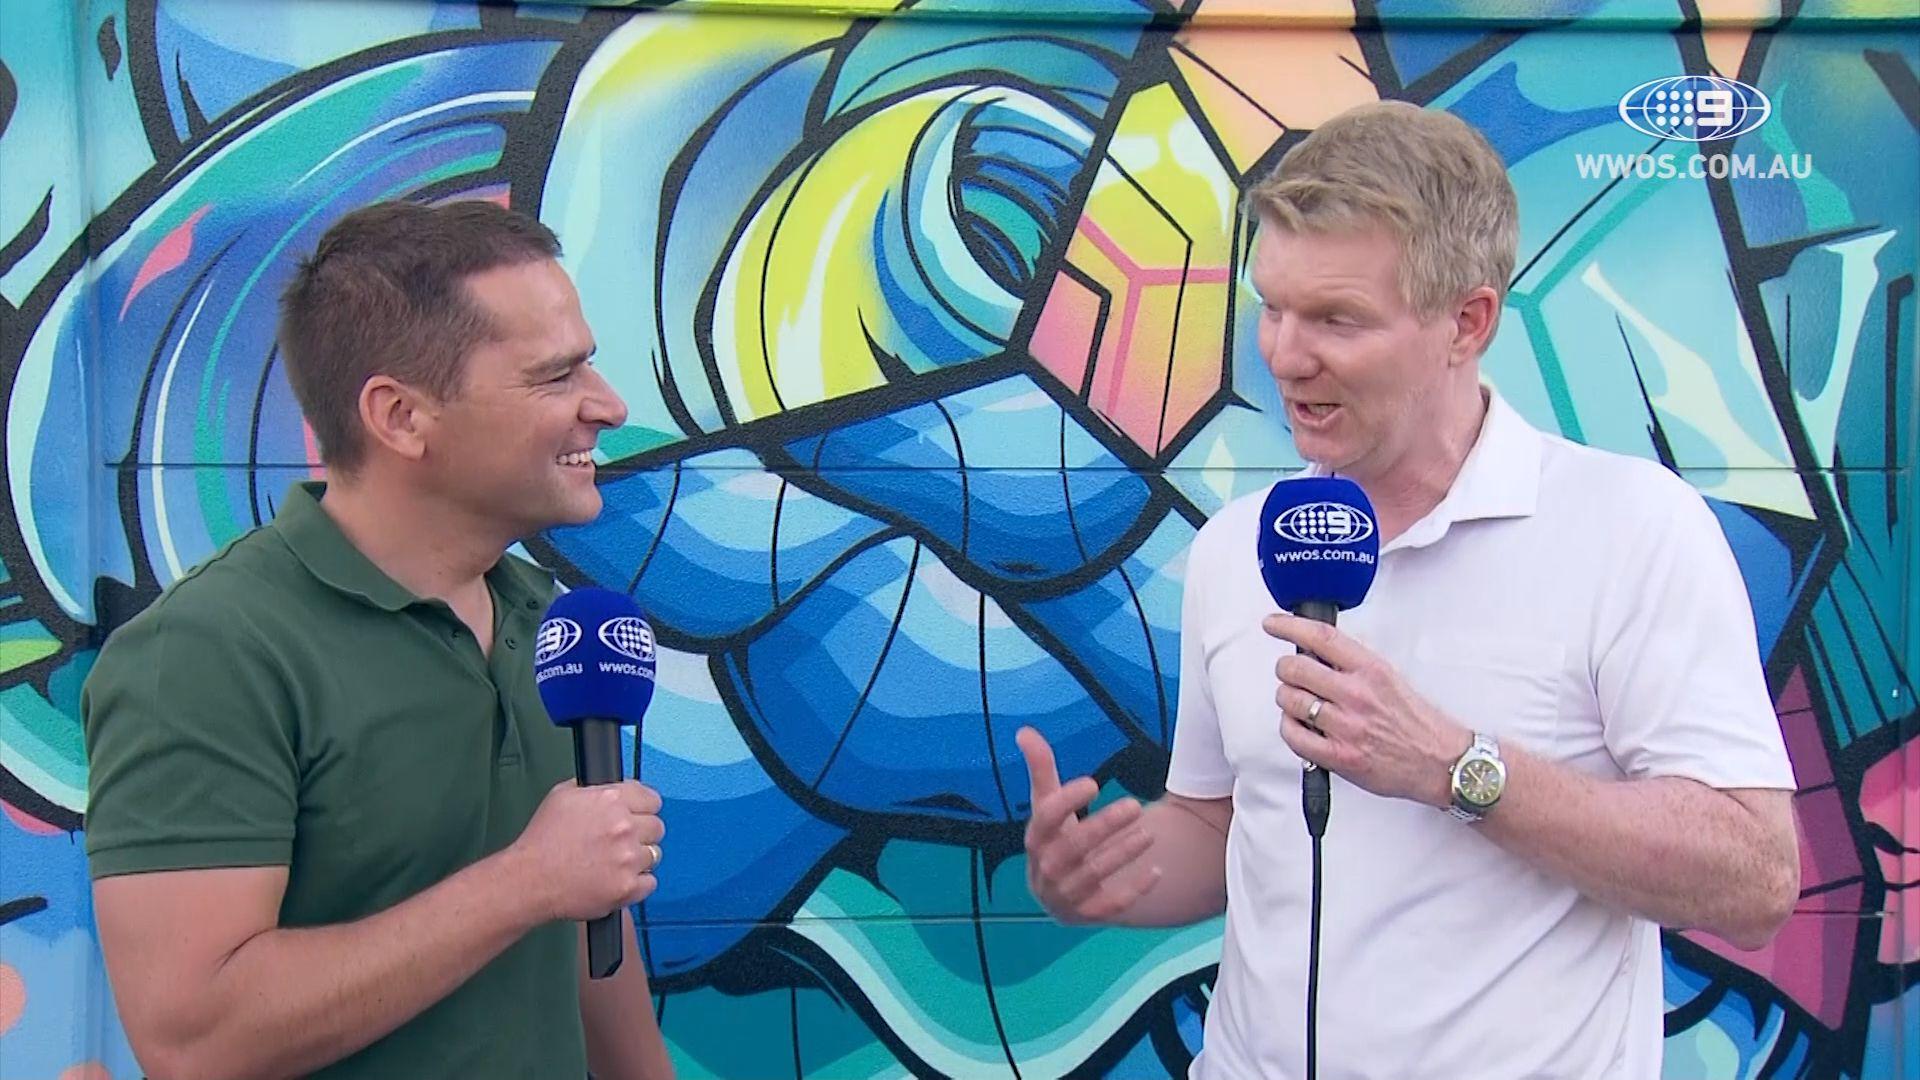 EXCLUSIVE: Jim Courier reveals the Australian Open final match-up Novak Djokovic wants to avoid